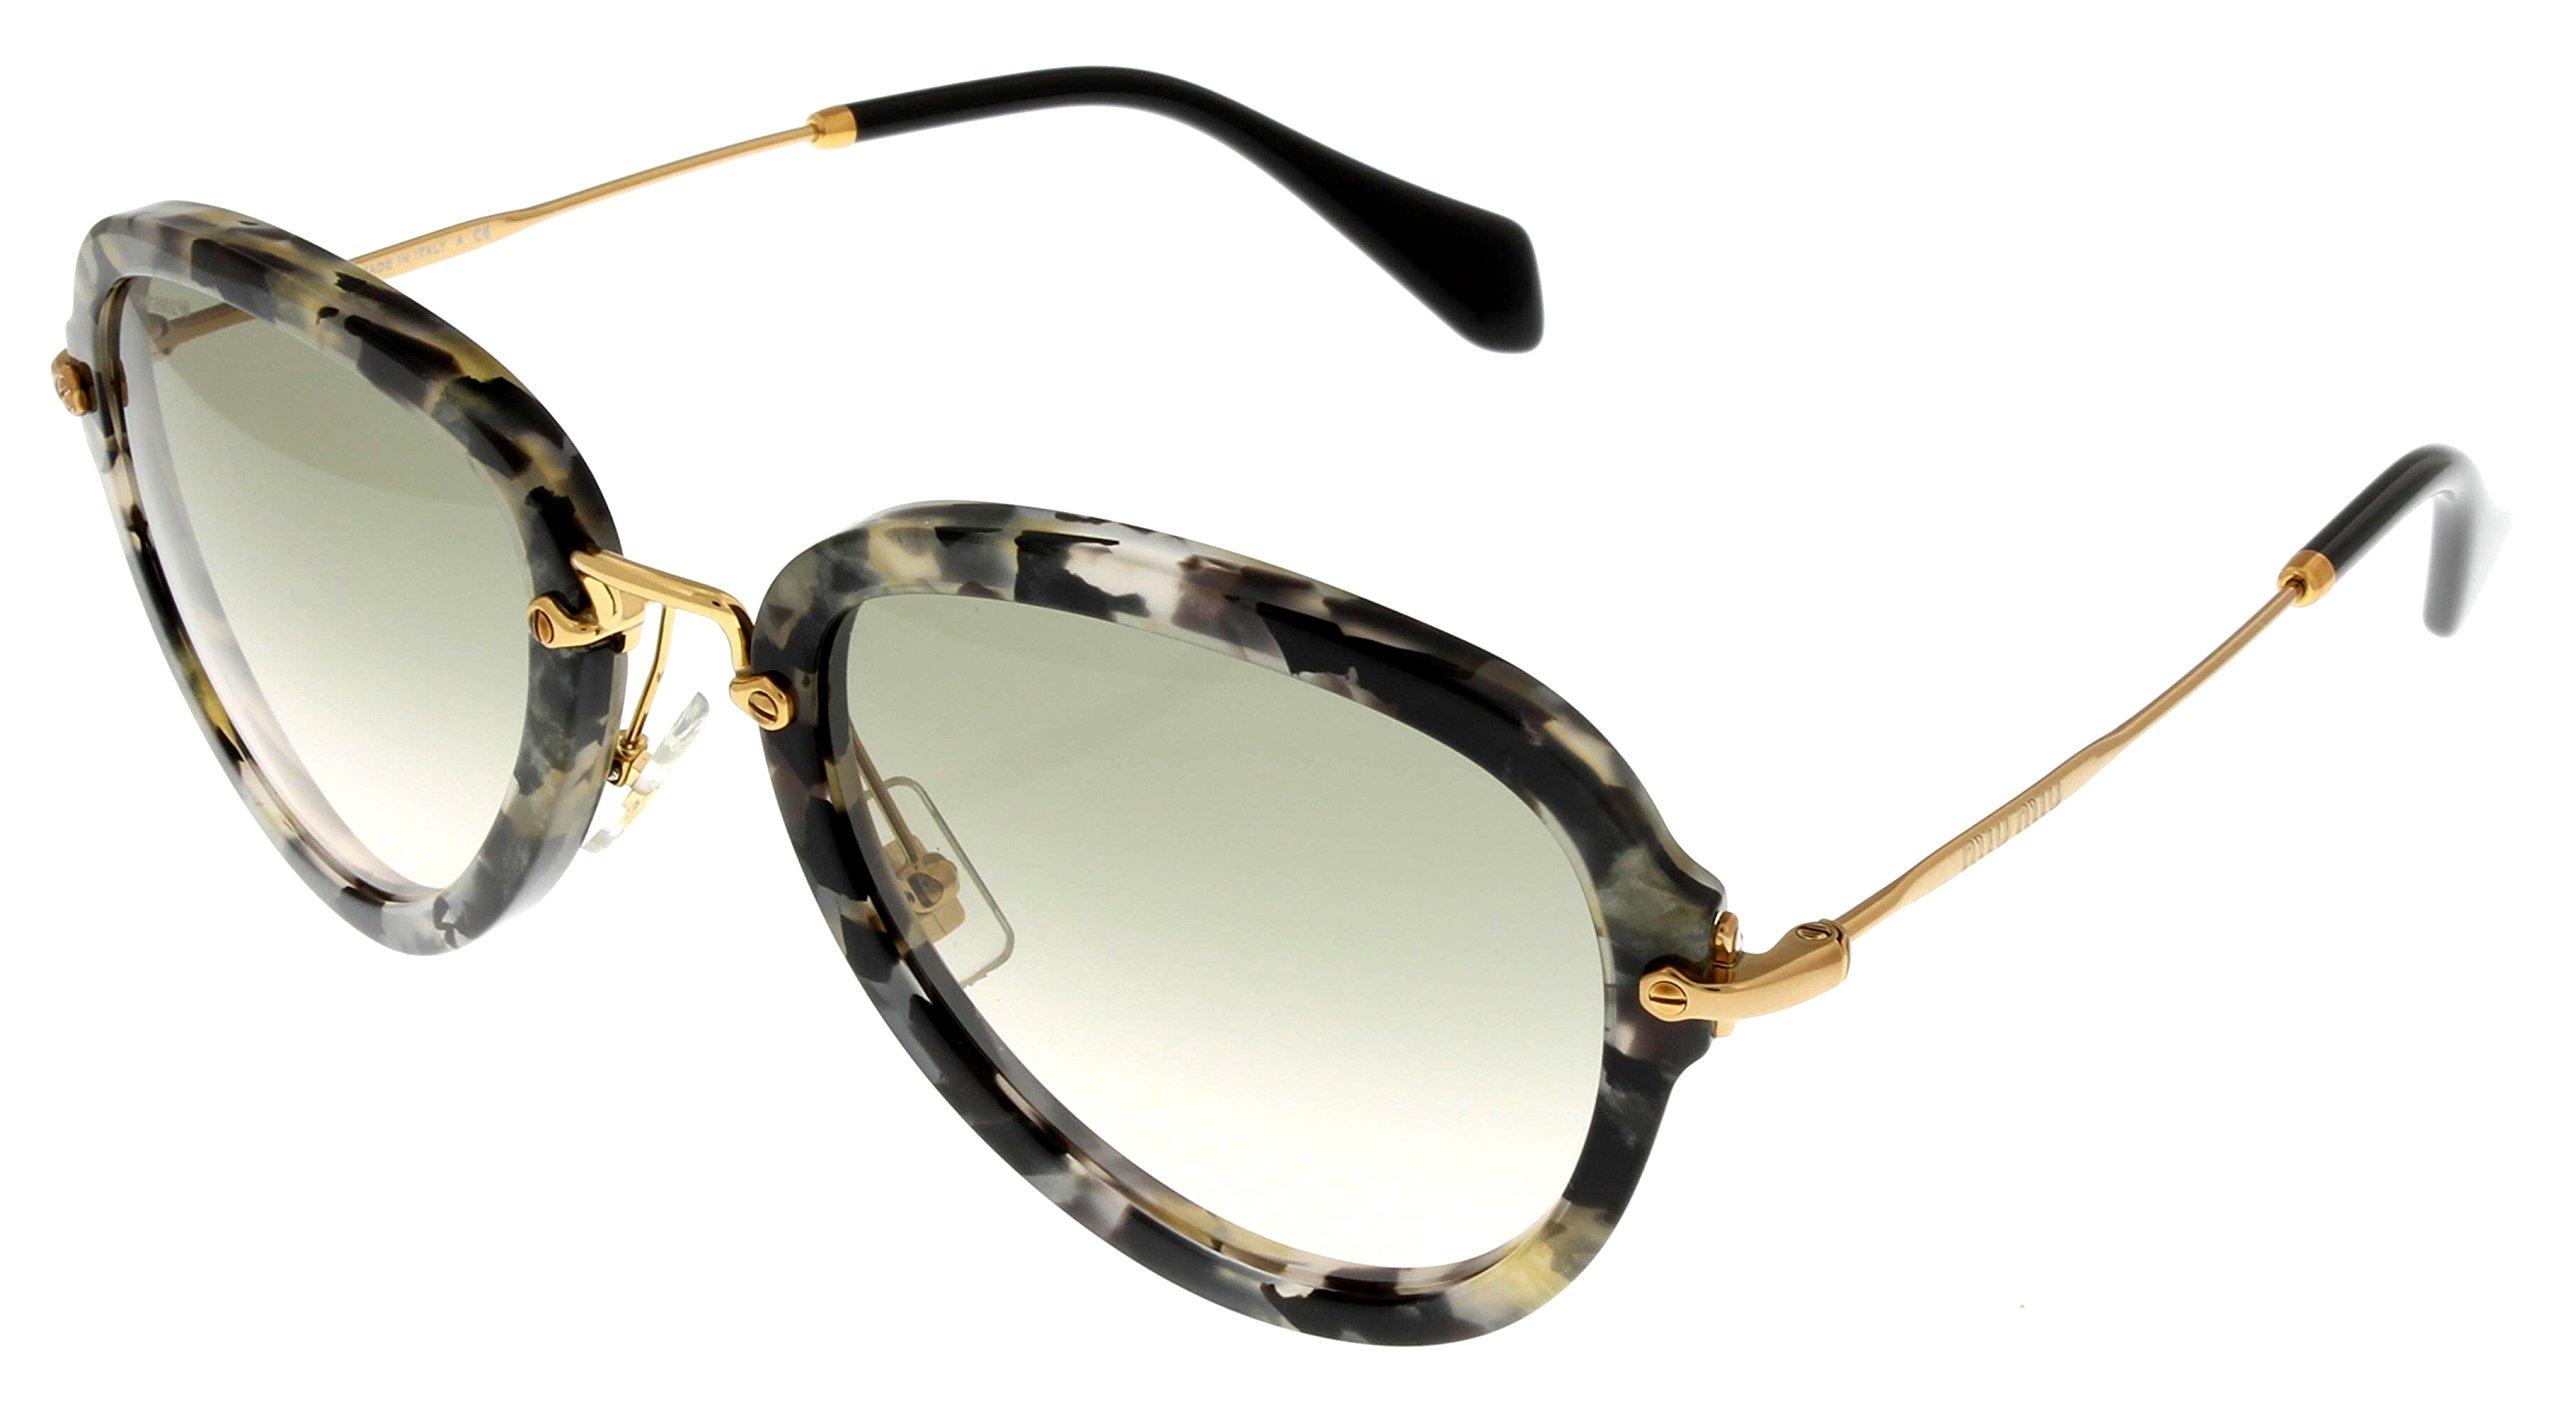 Miu Miu Sunglasses Women Havana Oval MU03QS DHE3H2